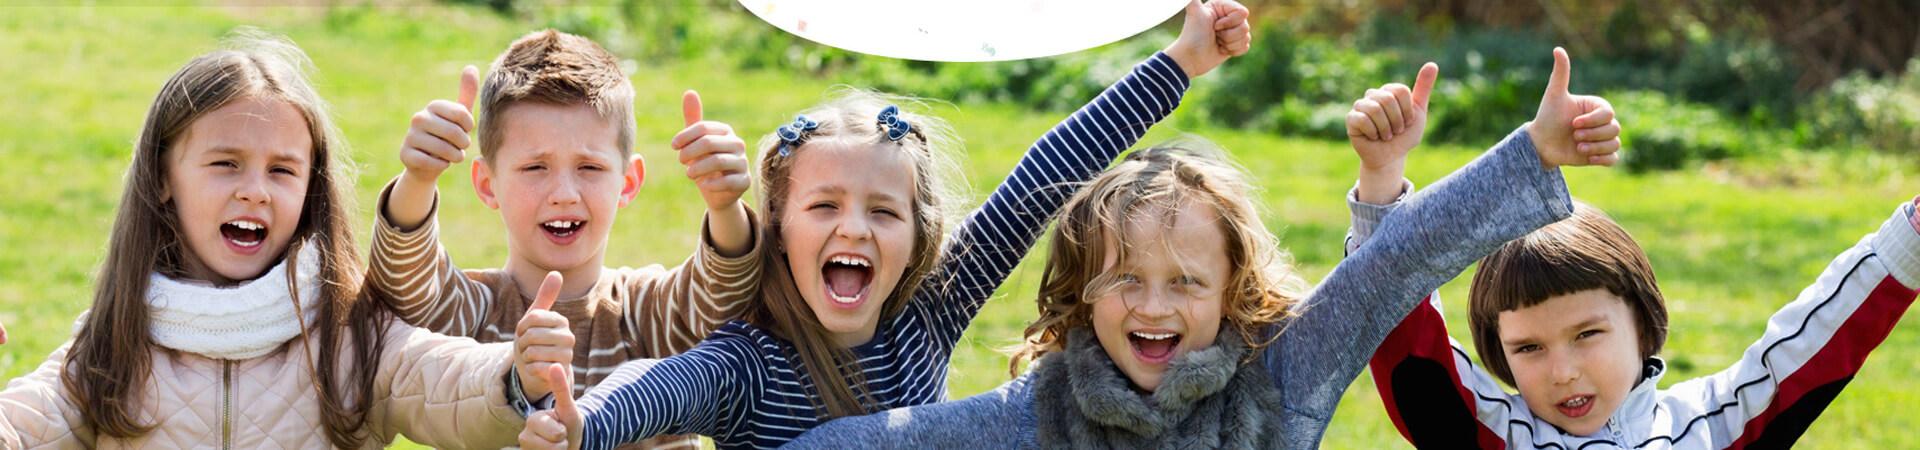 Joyful group of kids